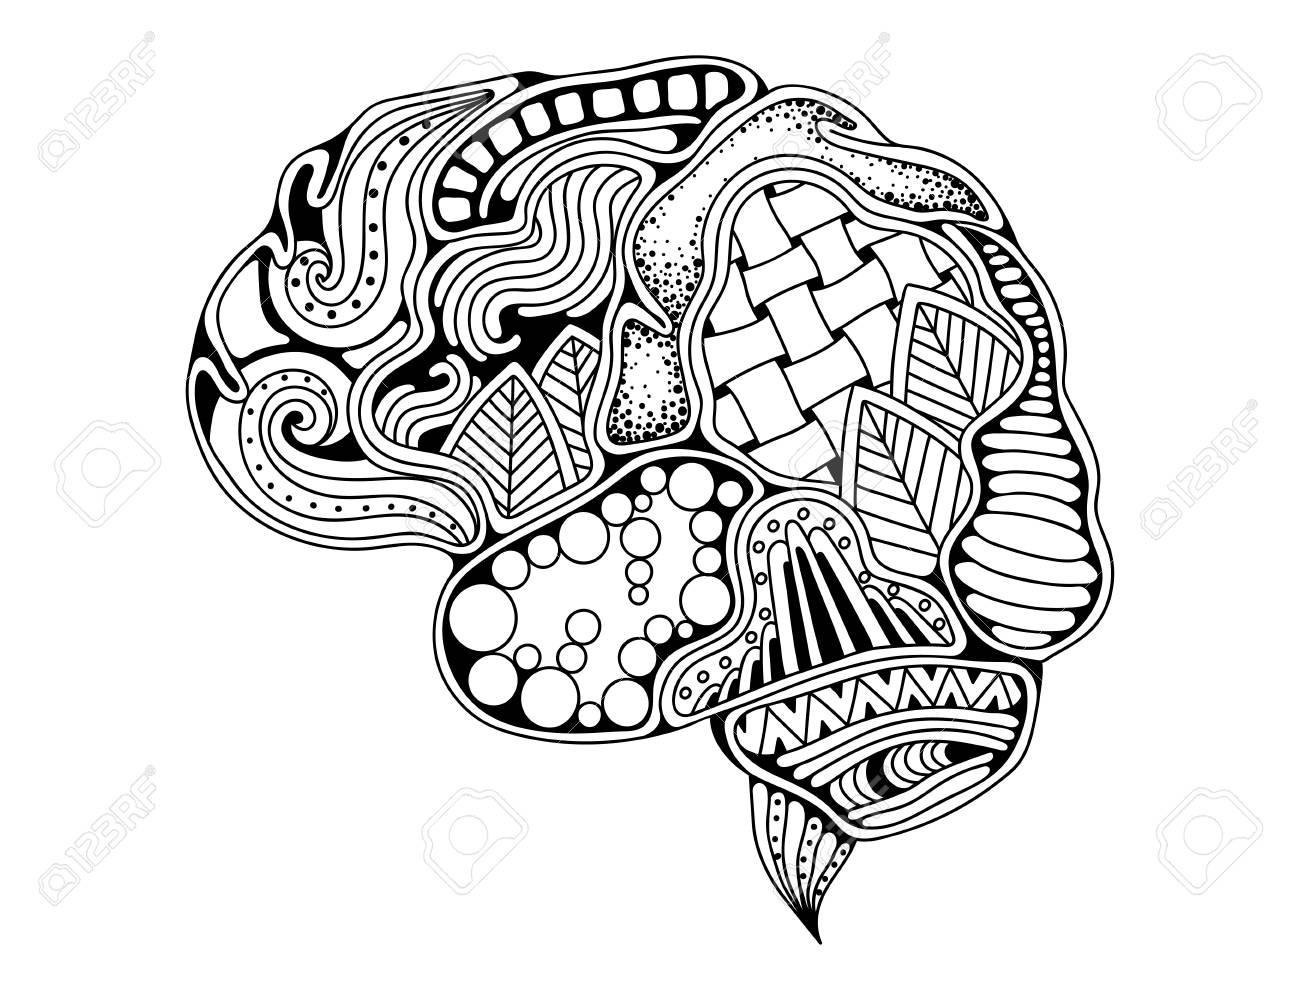 Human brain doodle decorative curves, creative mind, learning..